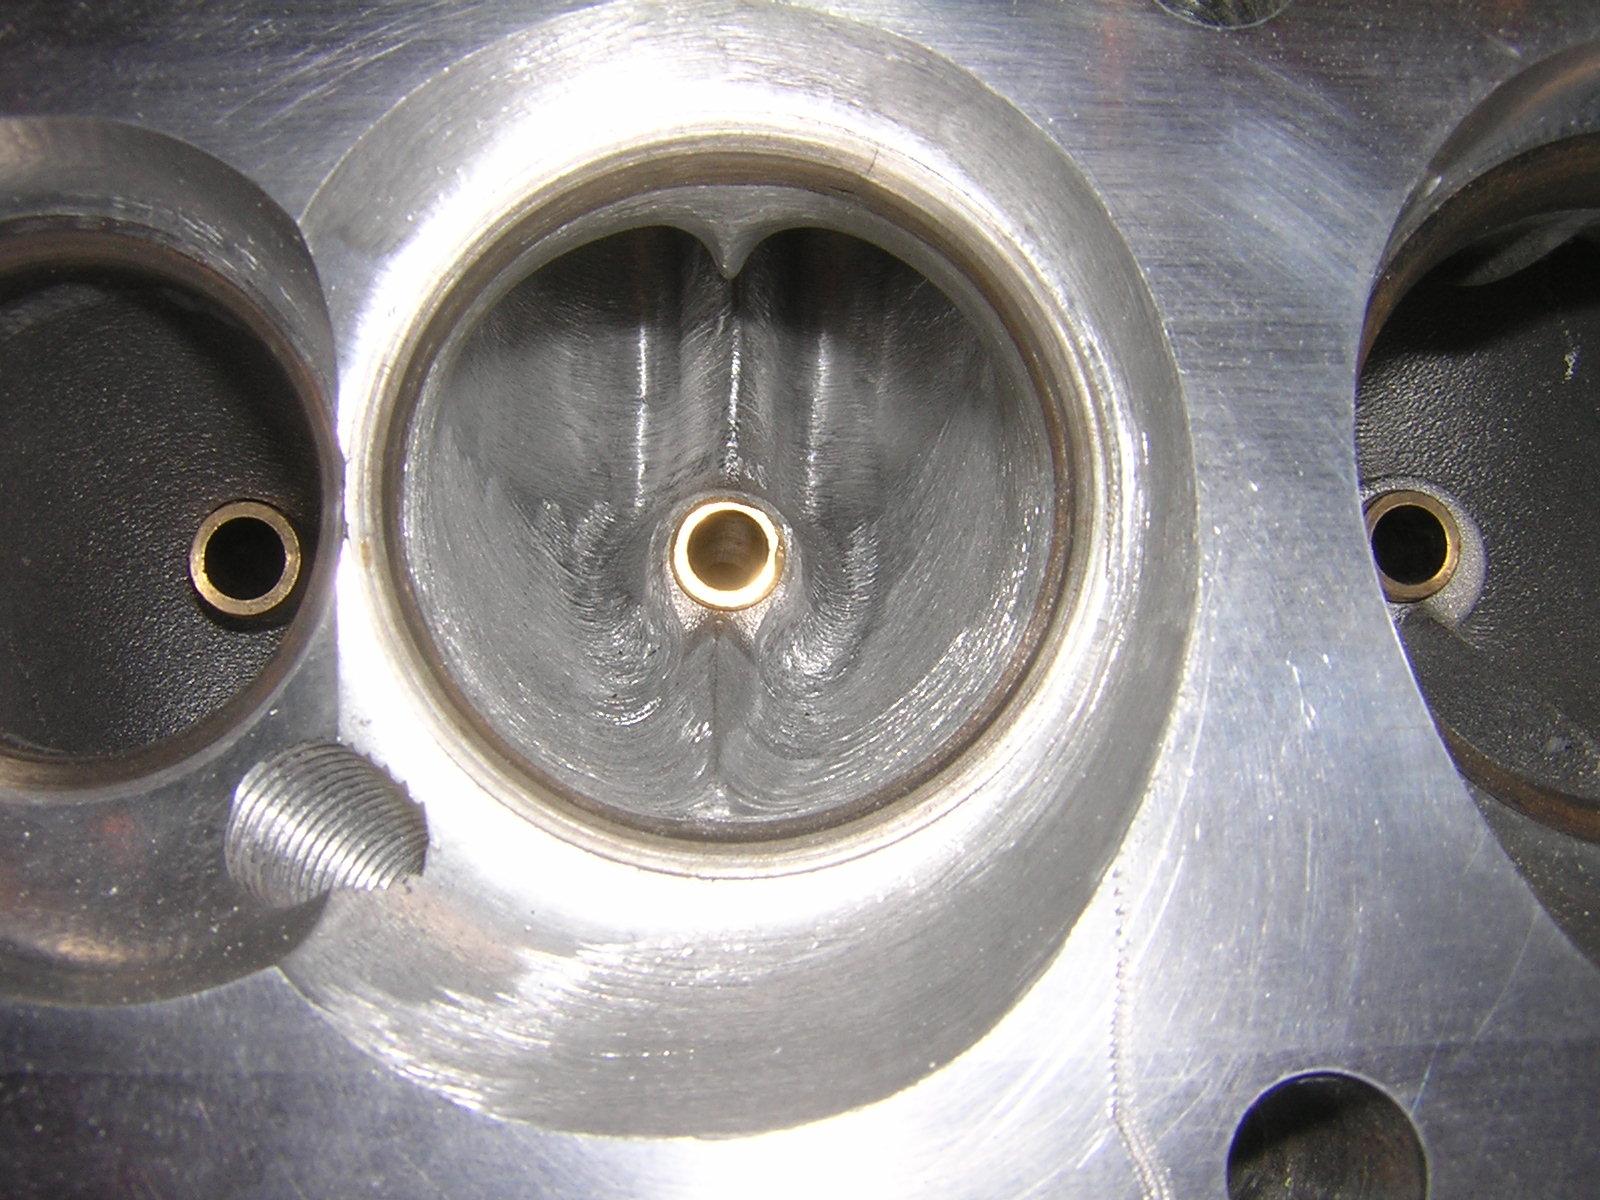 Raised Exhaust Ports (1 of 2)